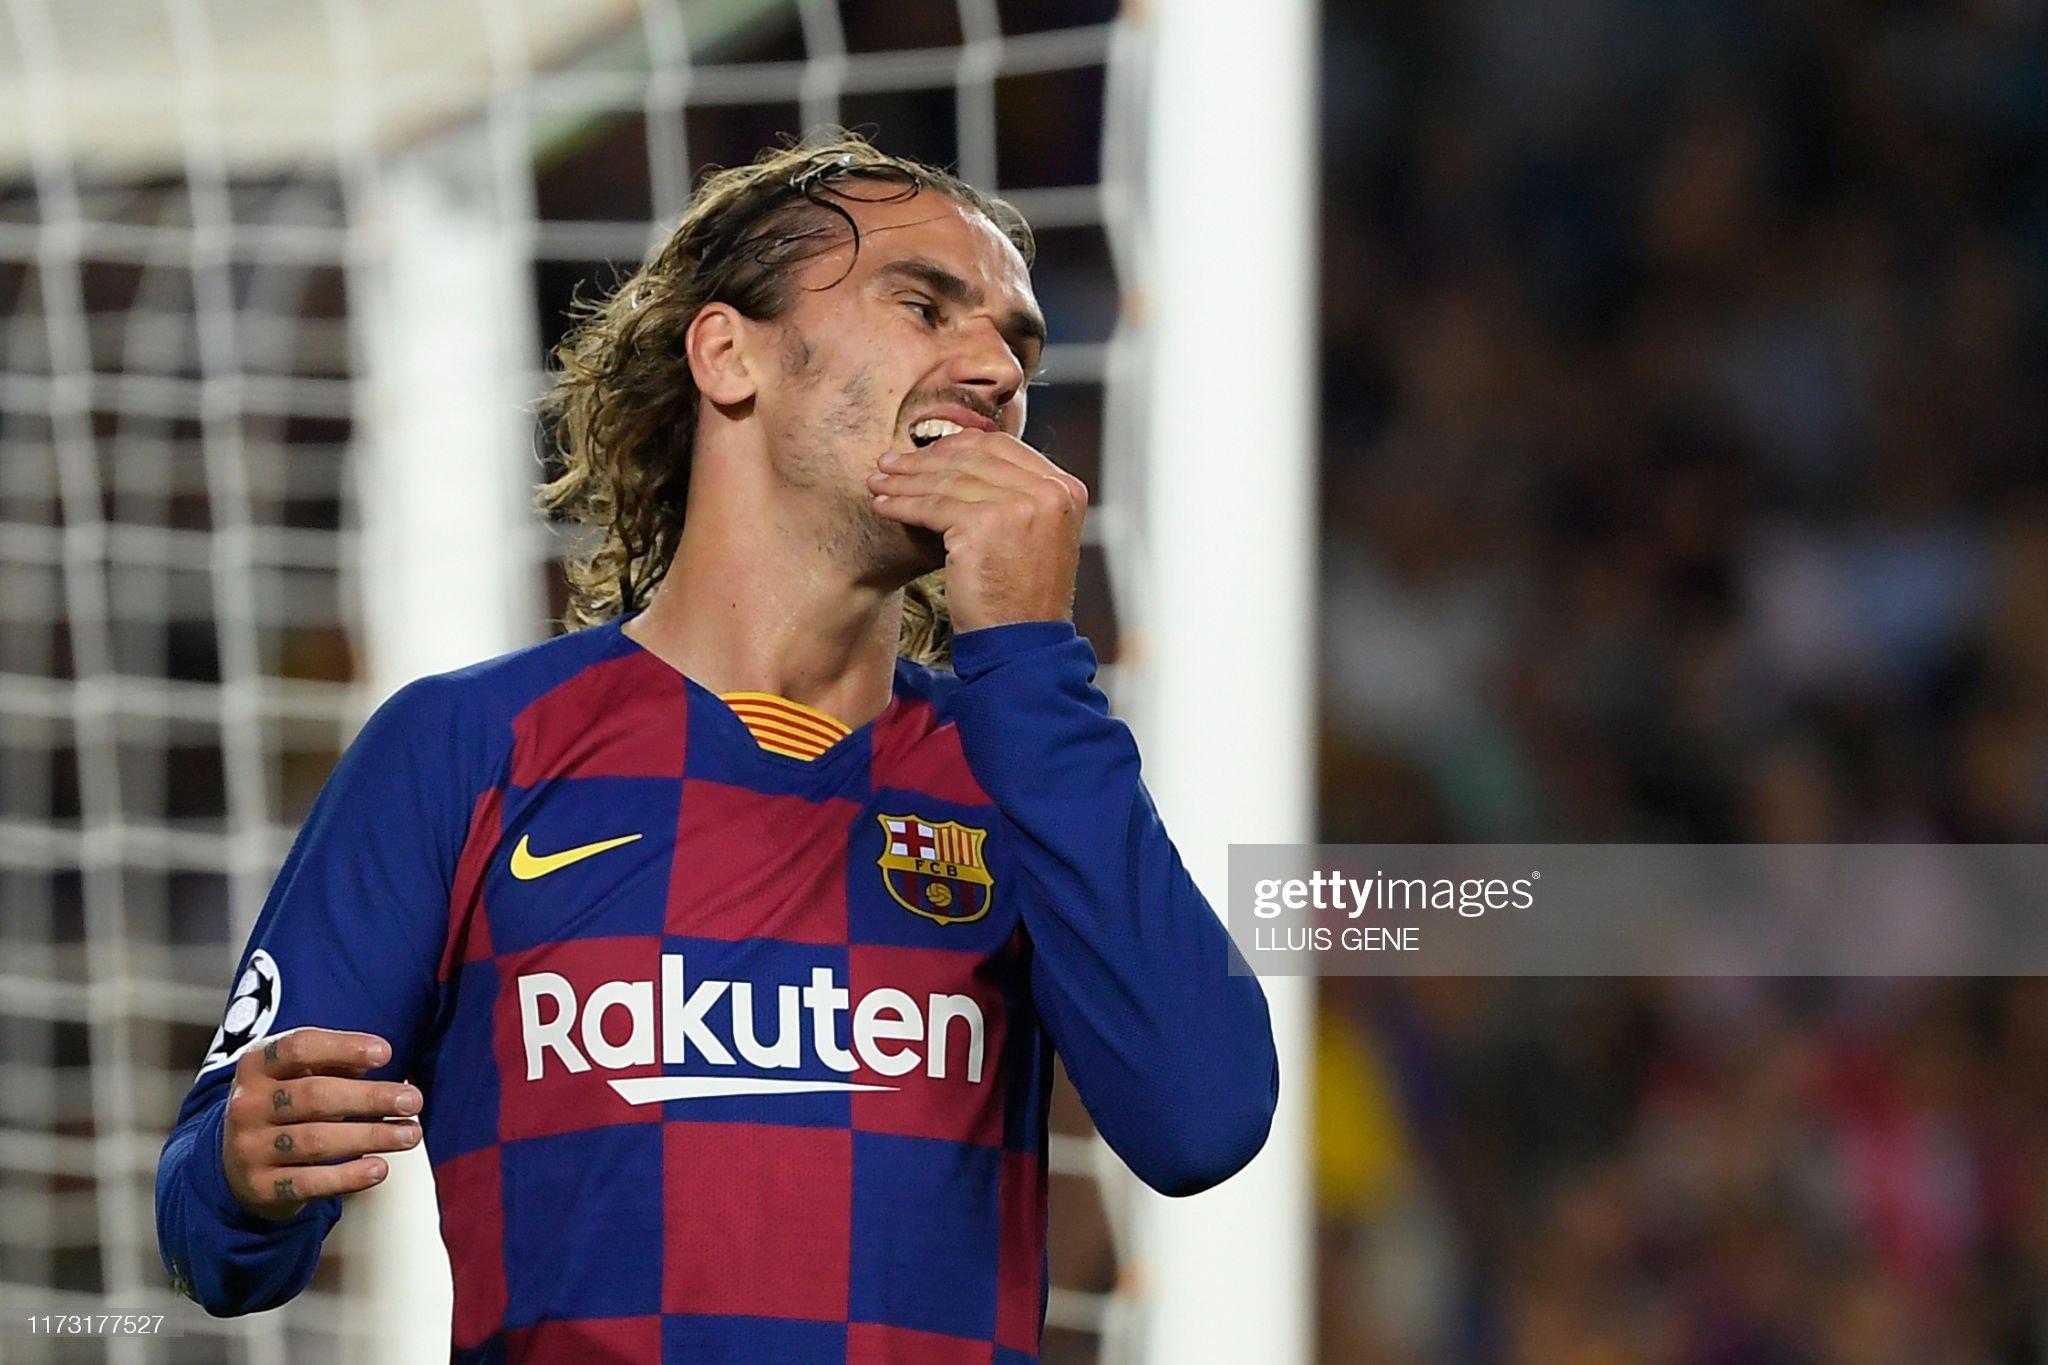 صور مباراة : برشلونة - إنتر 2-1 ( 02-10-2019 )  Barcelonas-french-forward-antoine-griezmann-reacts-after-missing-a-picture-id1173177527?s=2048x2048